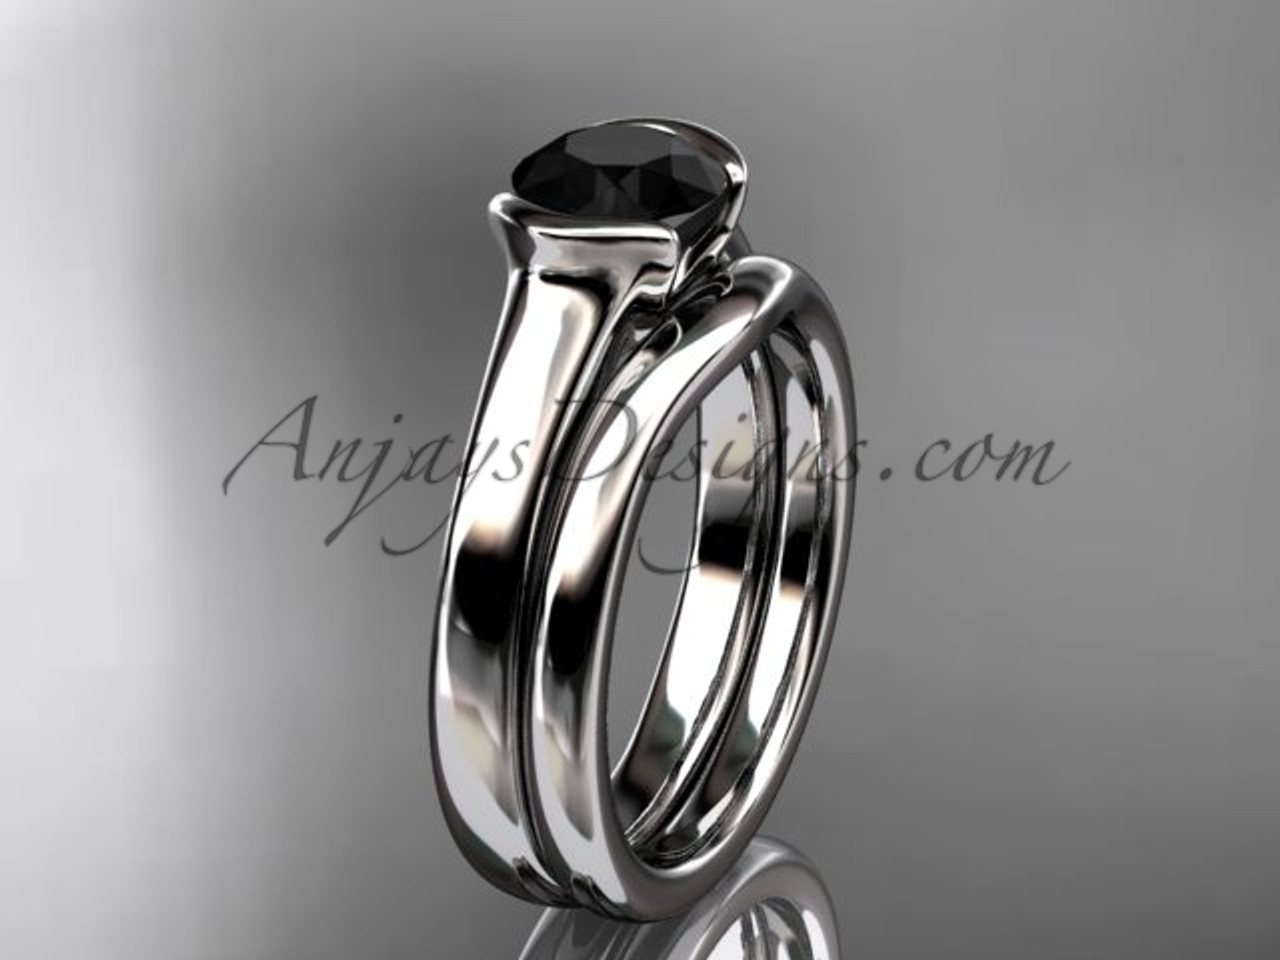 Vintage Wedding Sets White Gold Black Diamond Ring Vd10016s